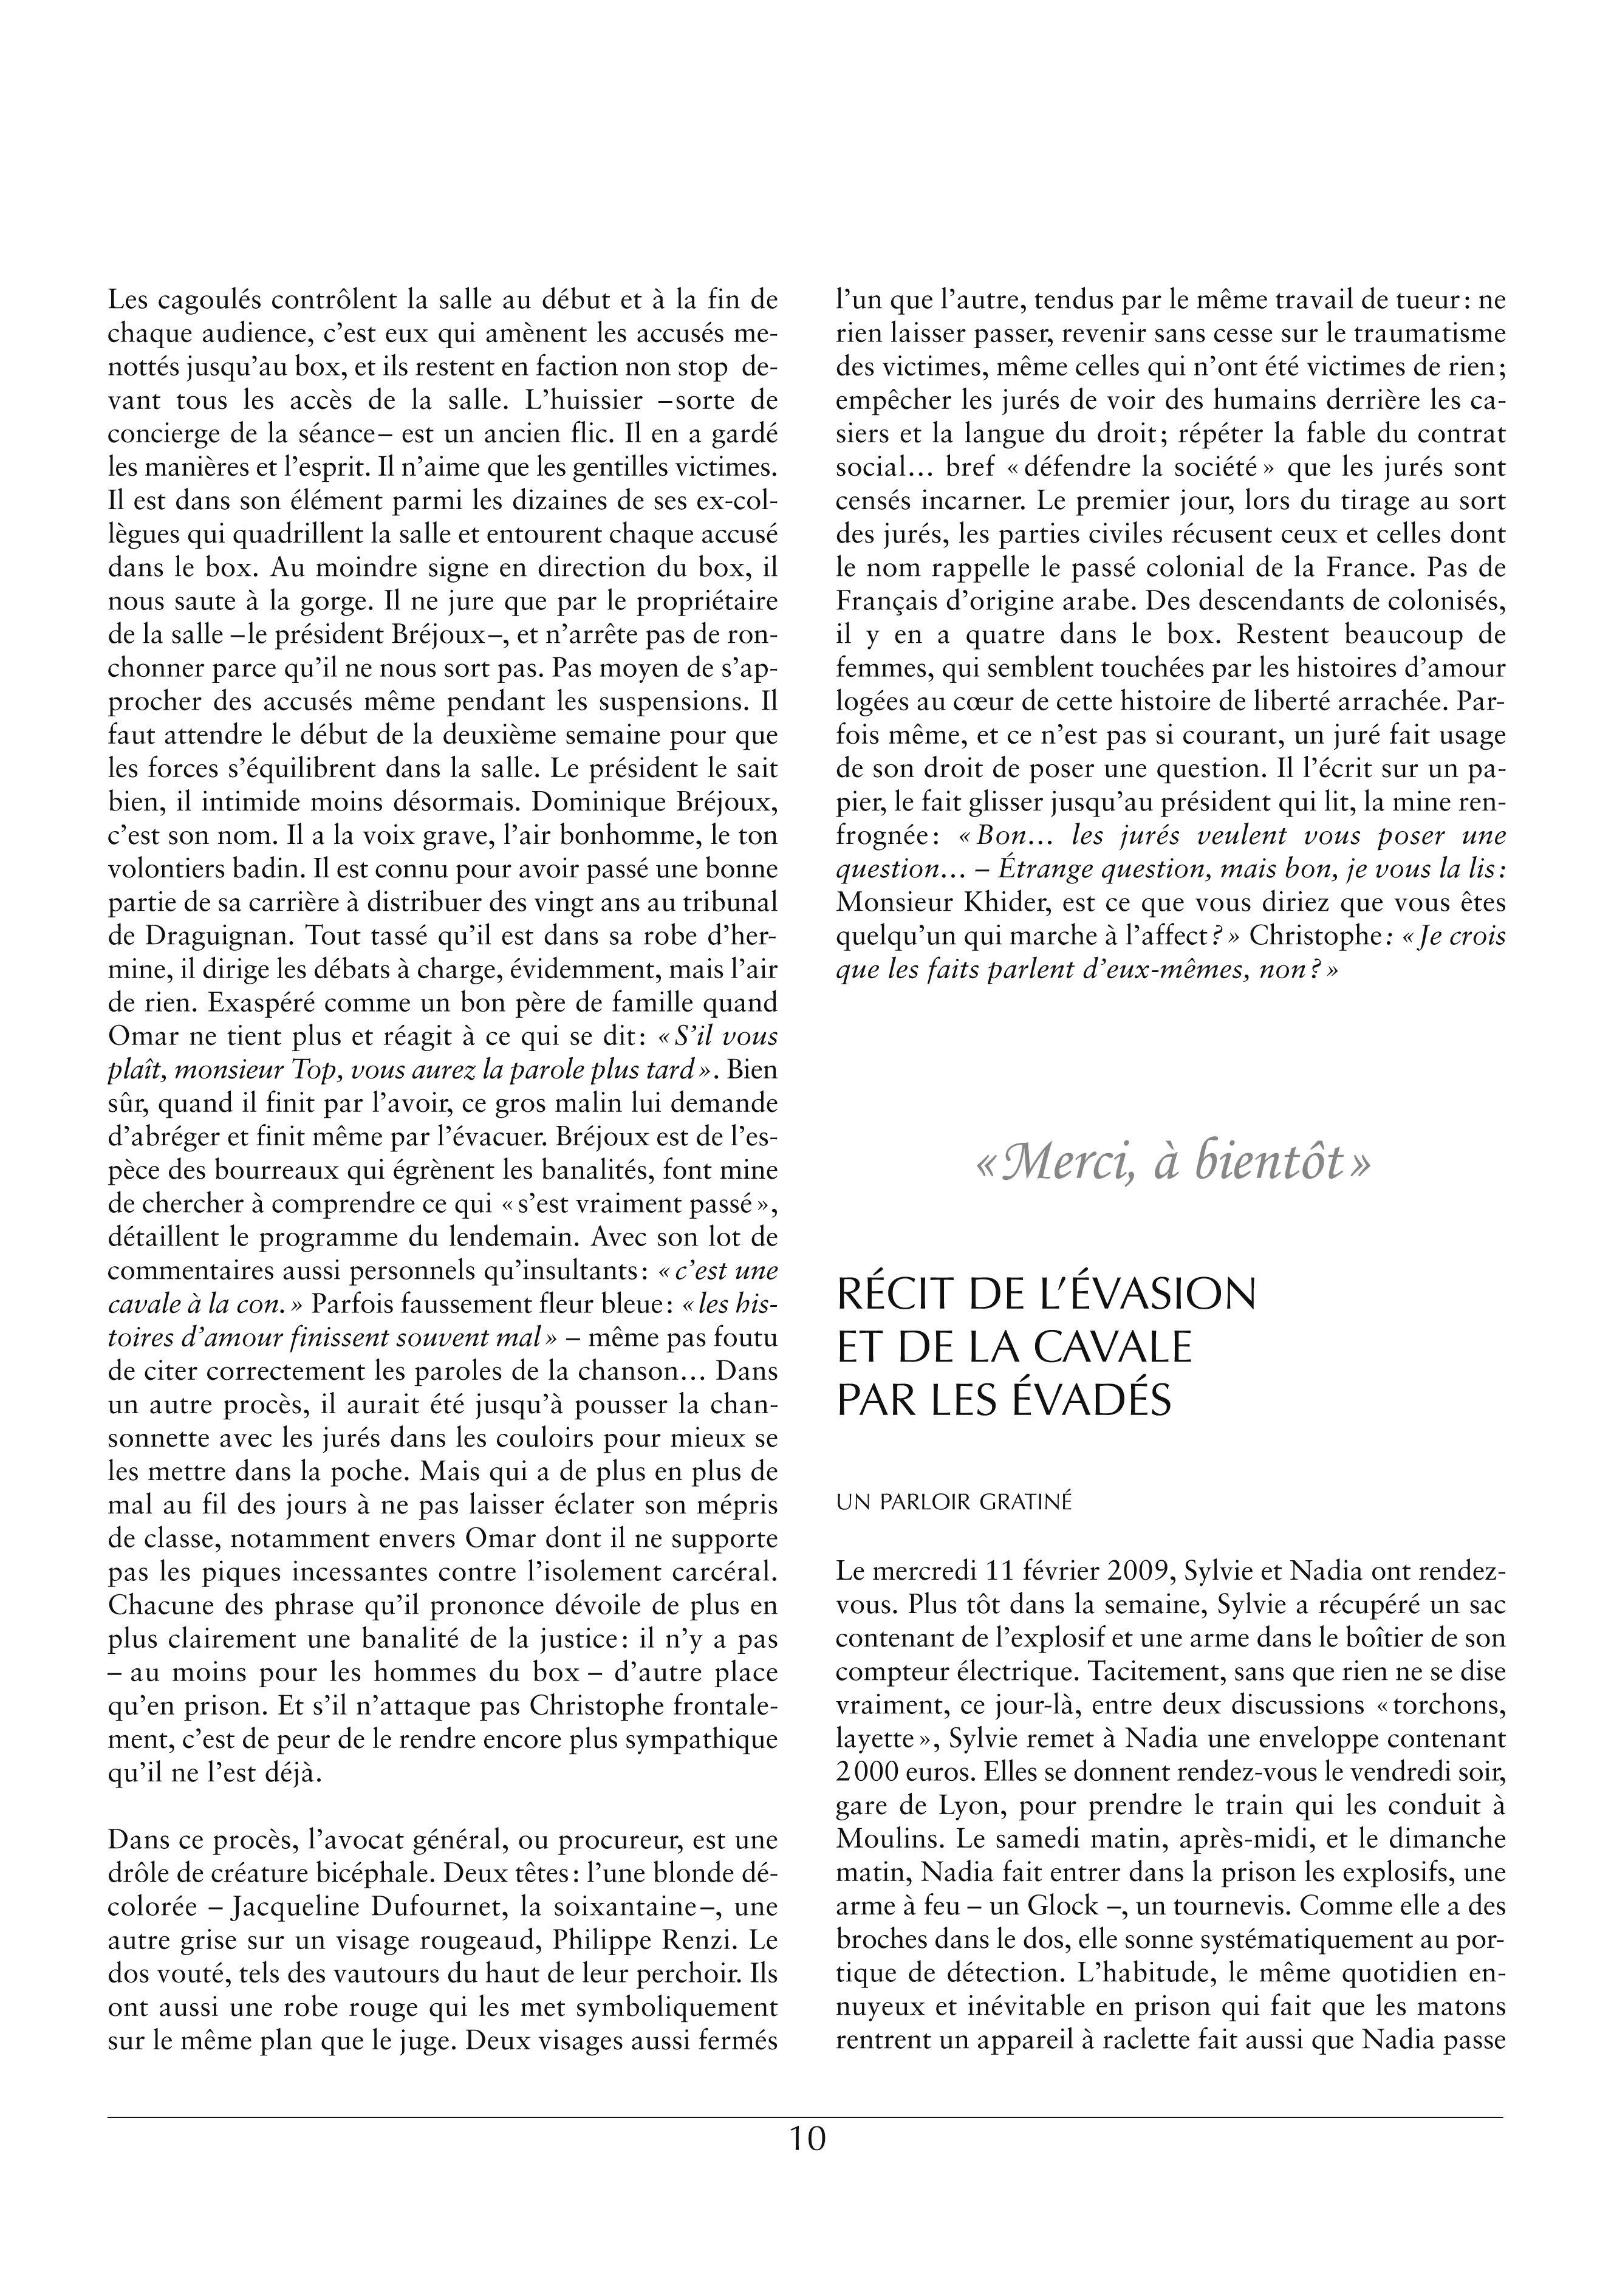 lenvolee_35 1_Page_10